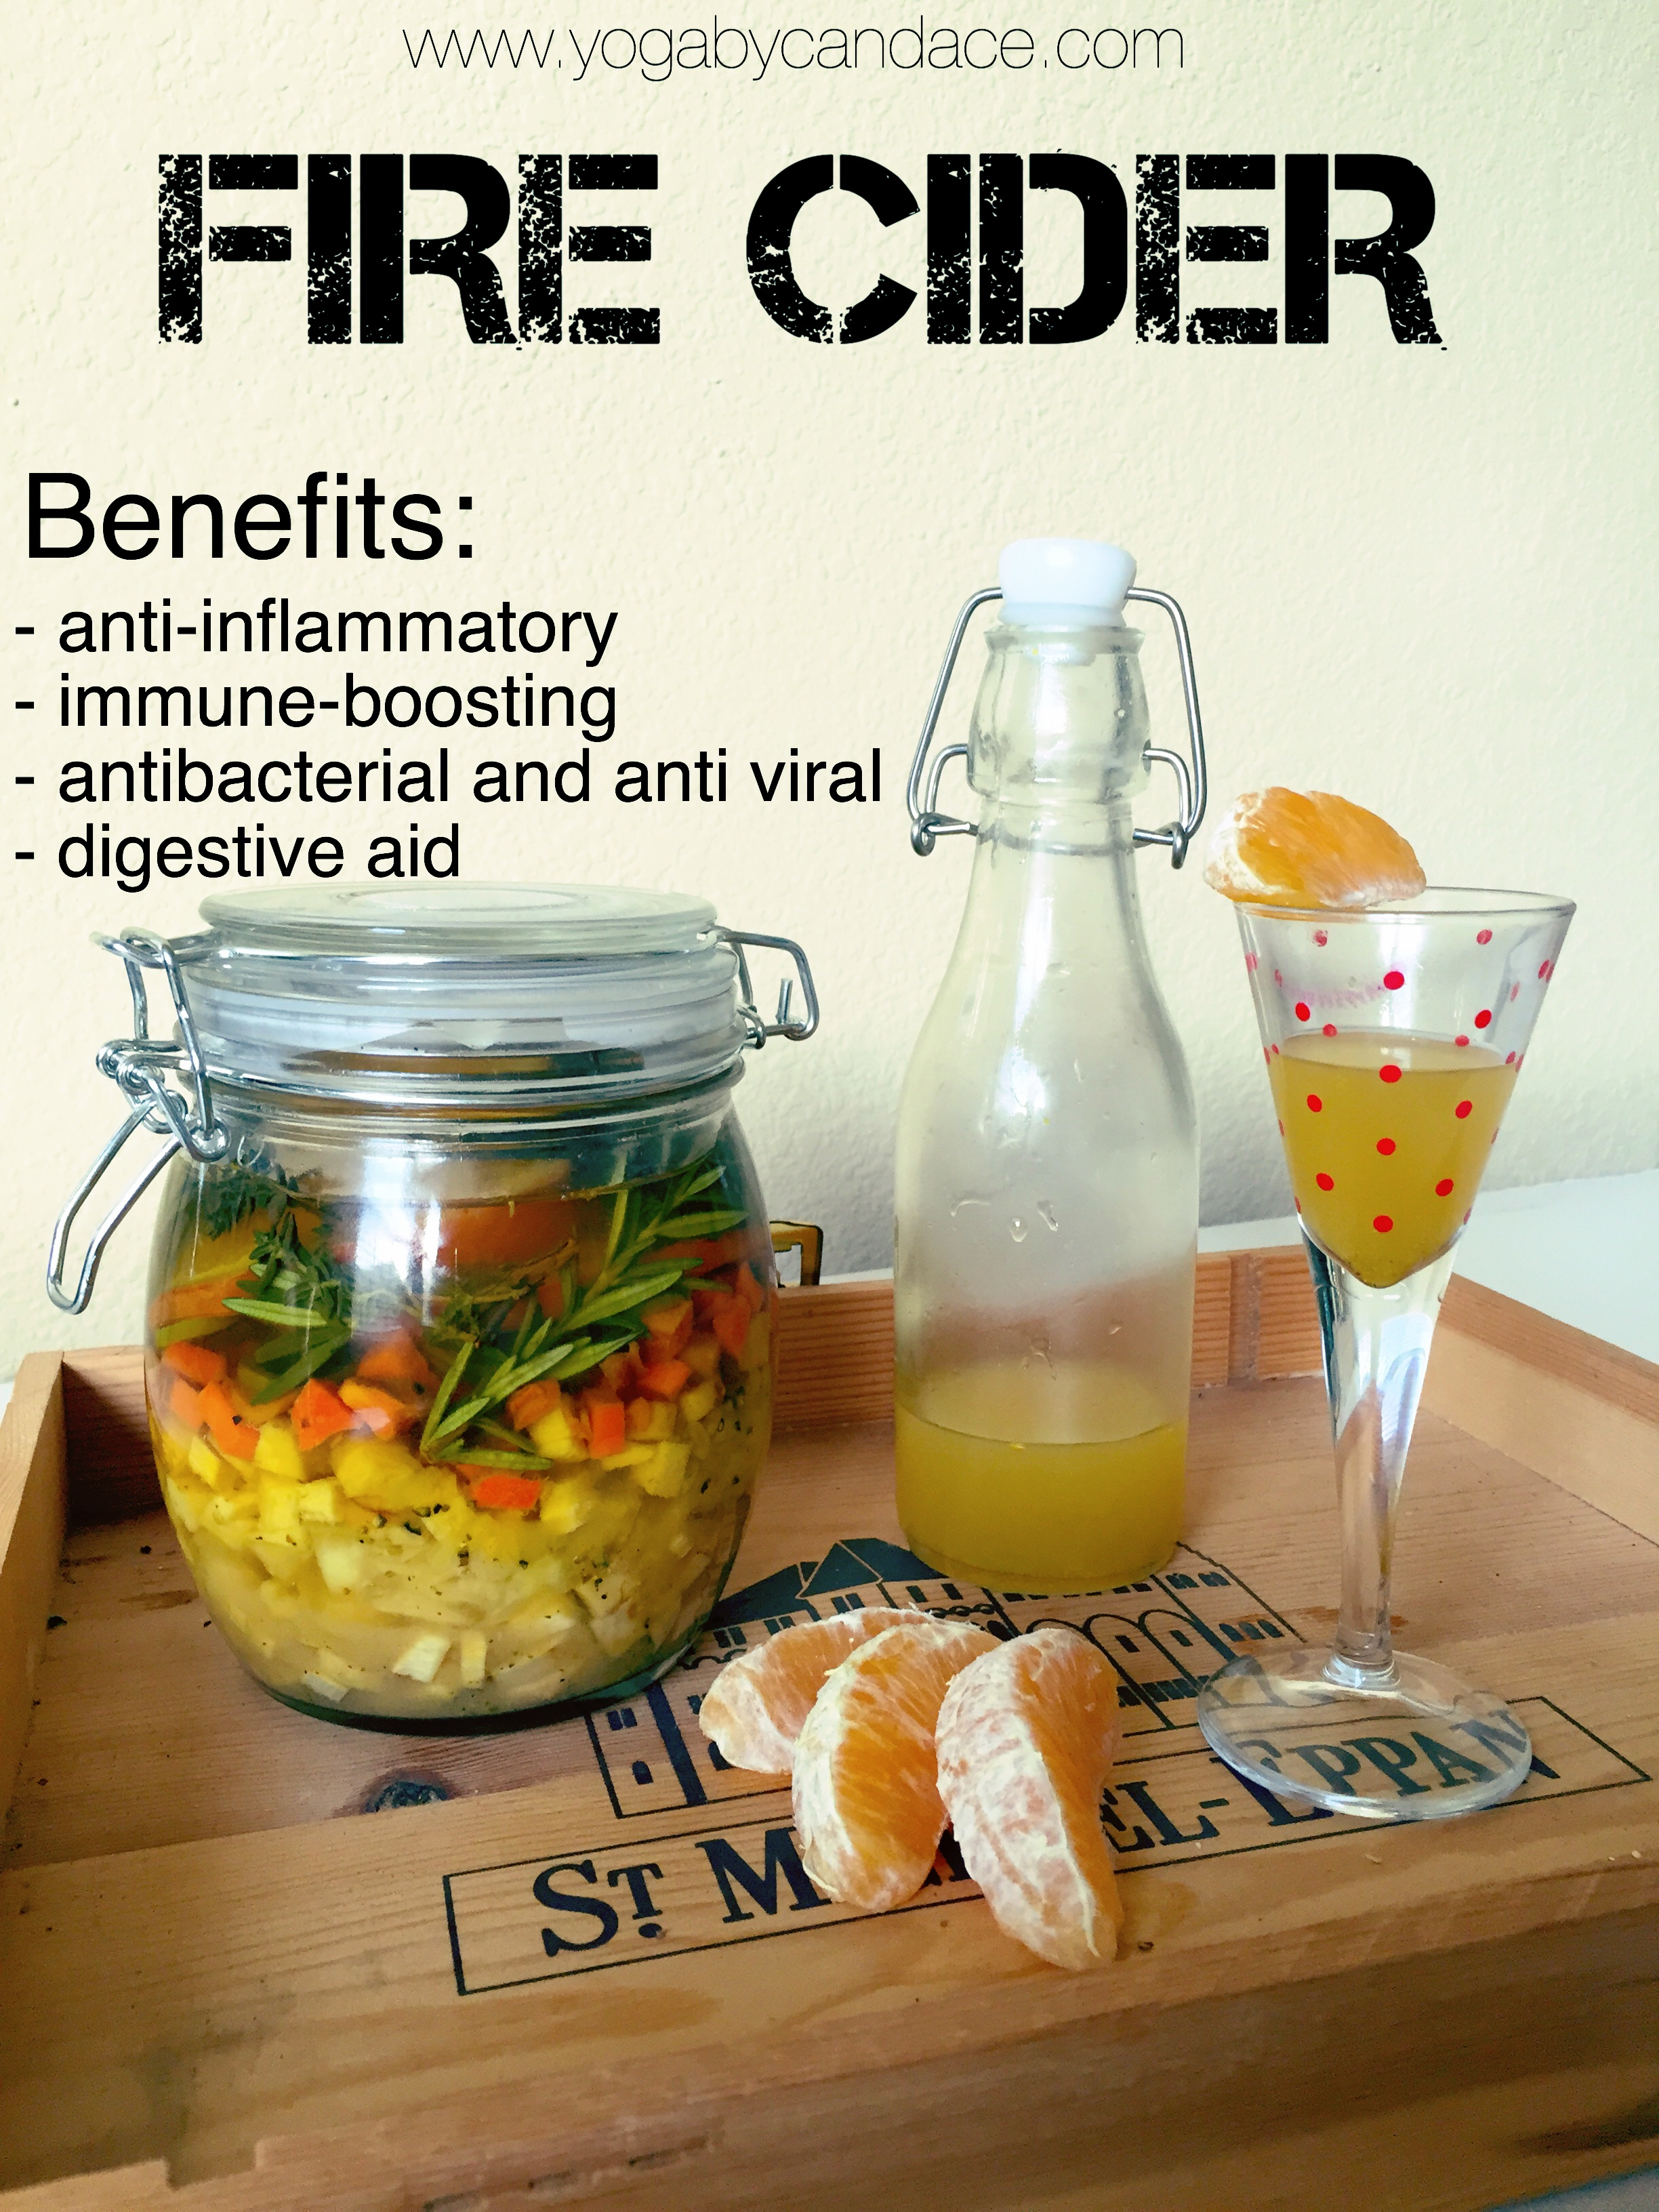 Fire Cider Tonic Benefits